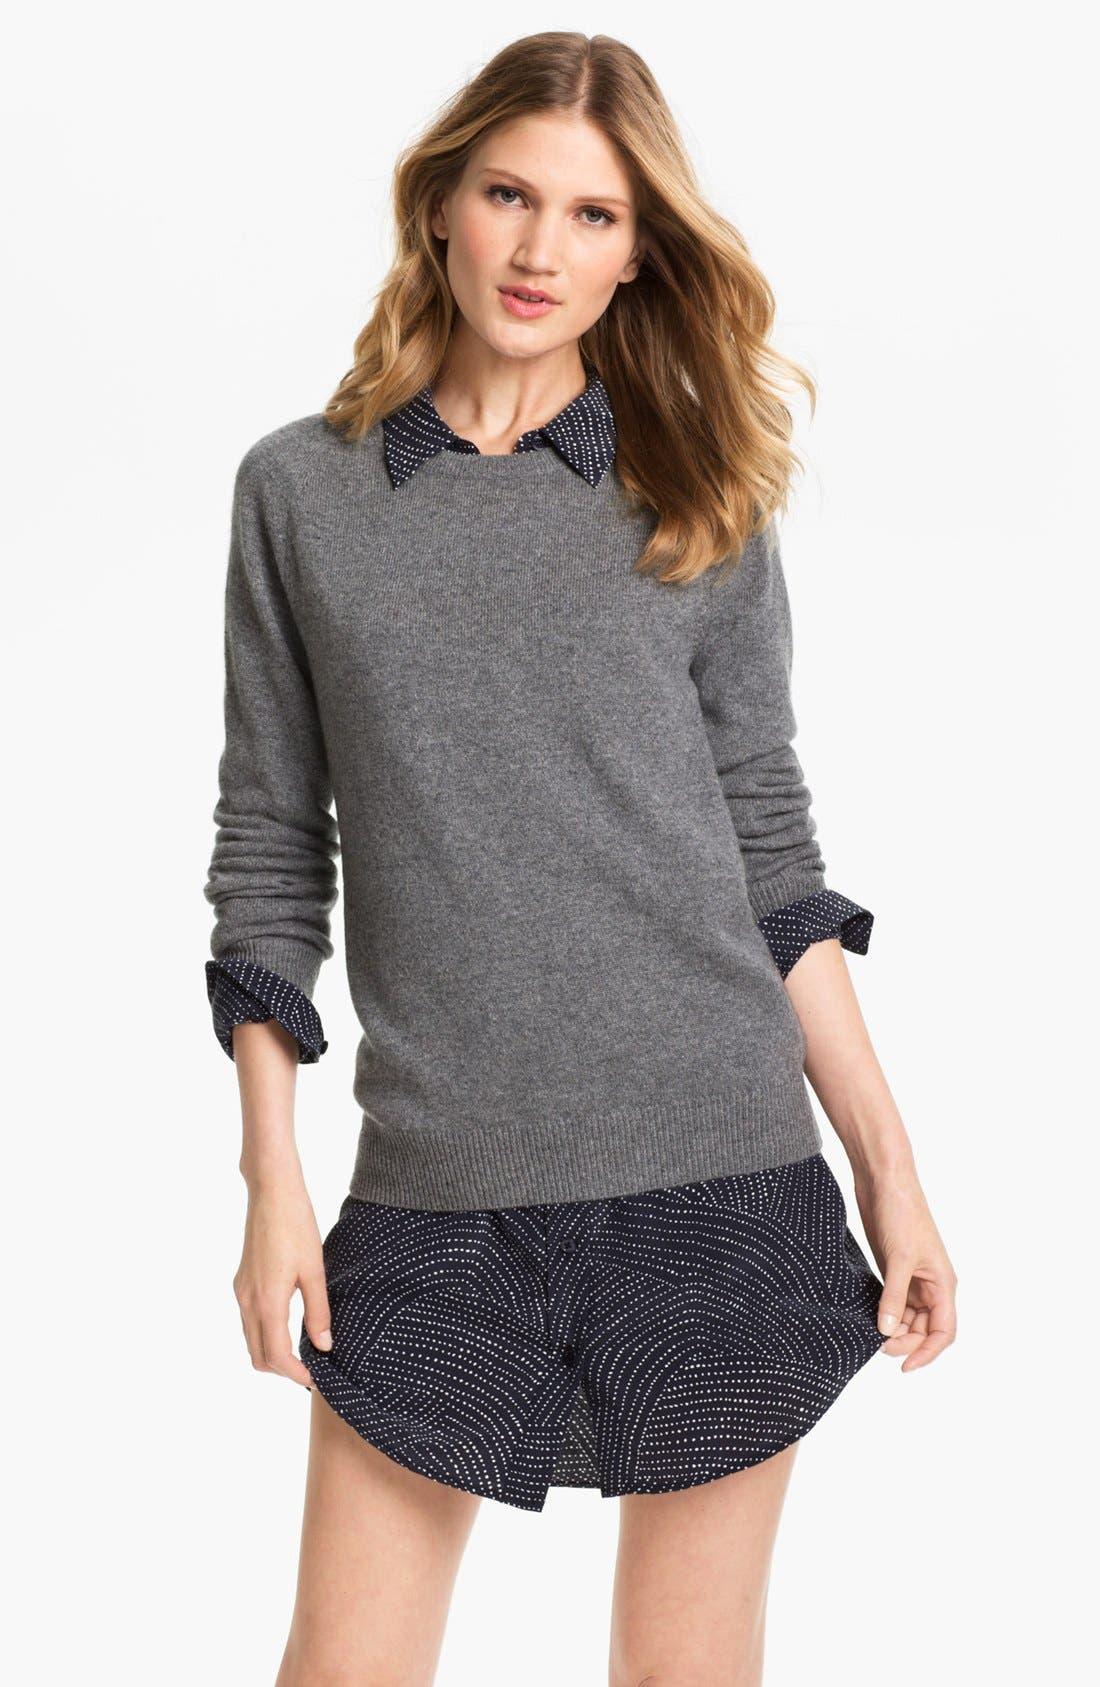 EQUIPMENT 'Sloane' Crewneck Cashmere Sweater, Main, color, 021